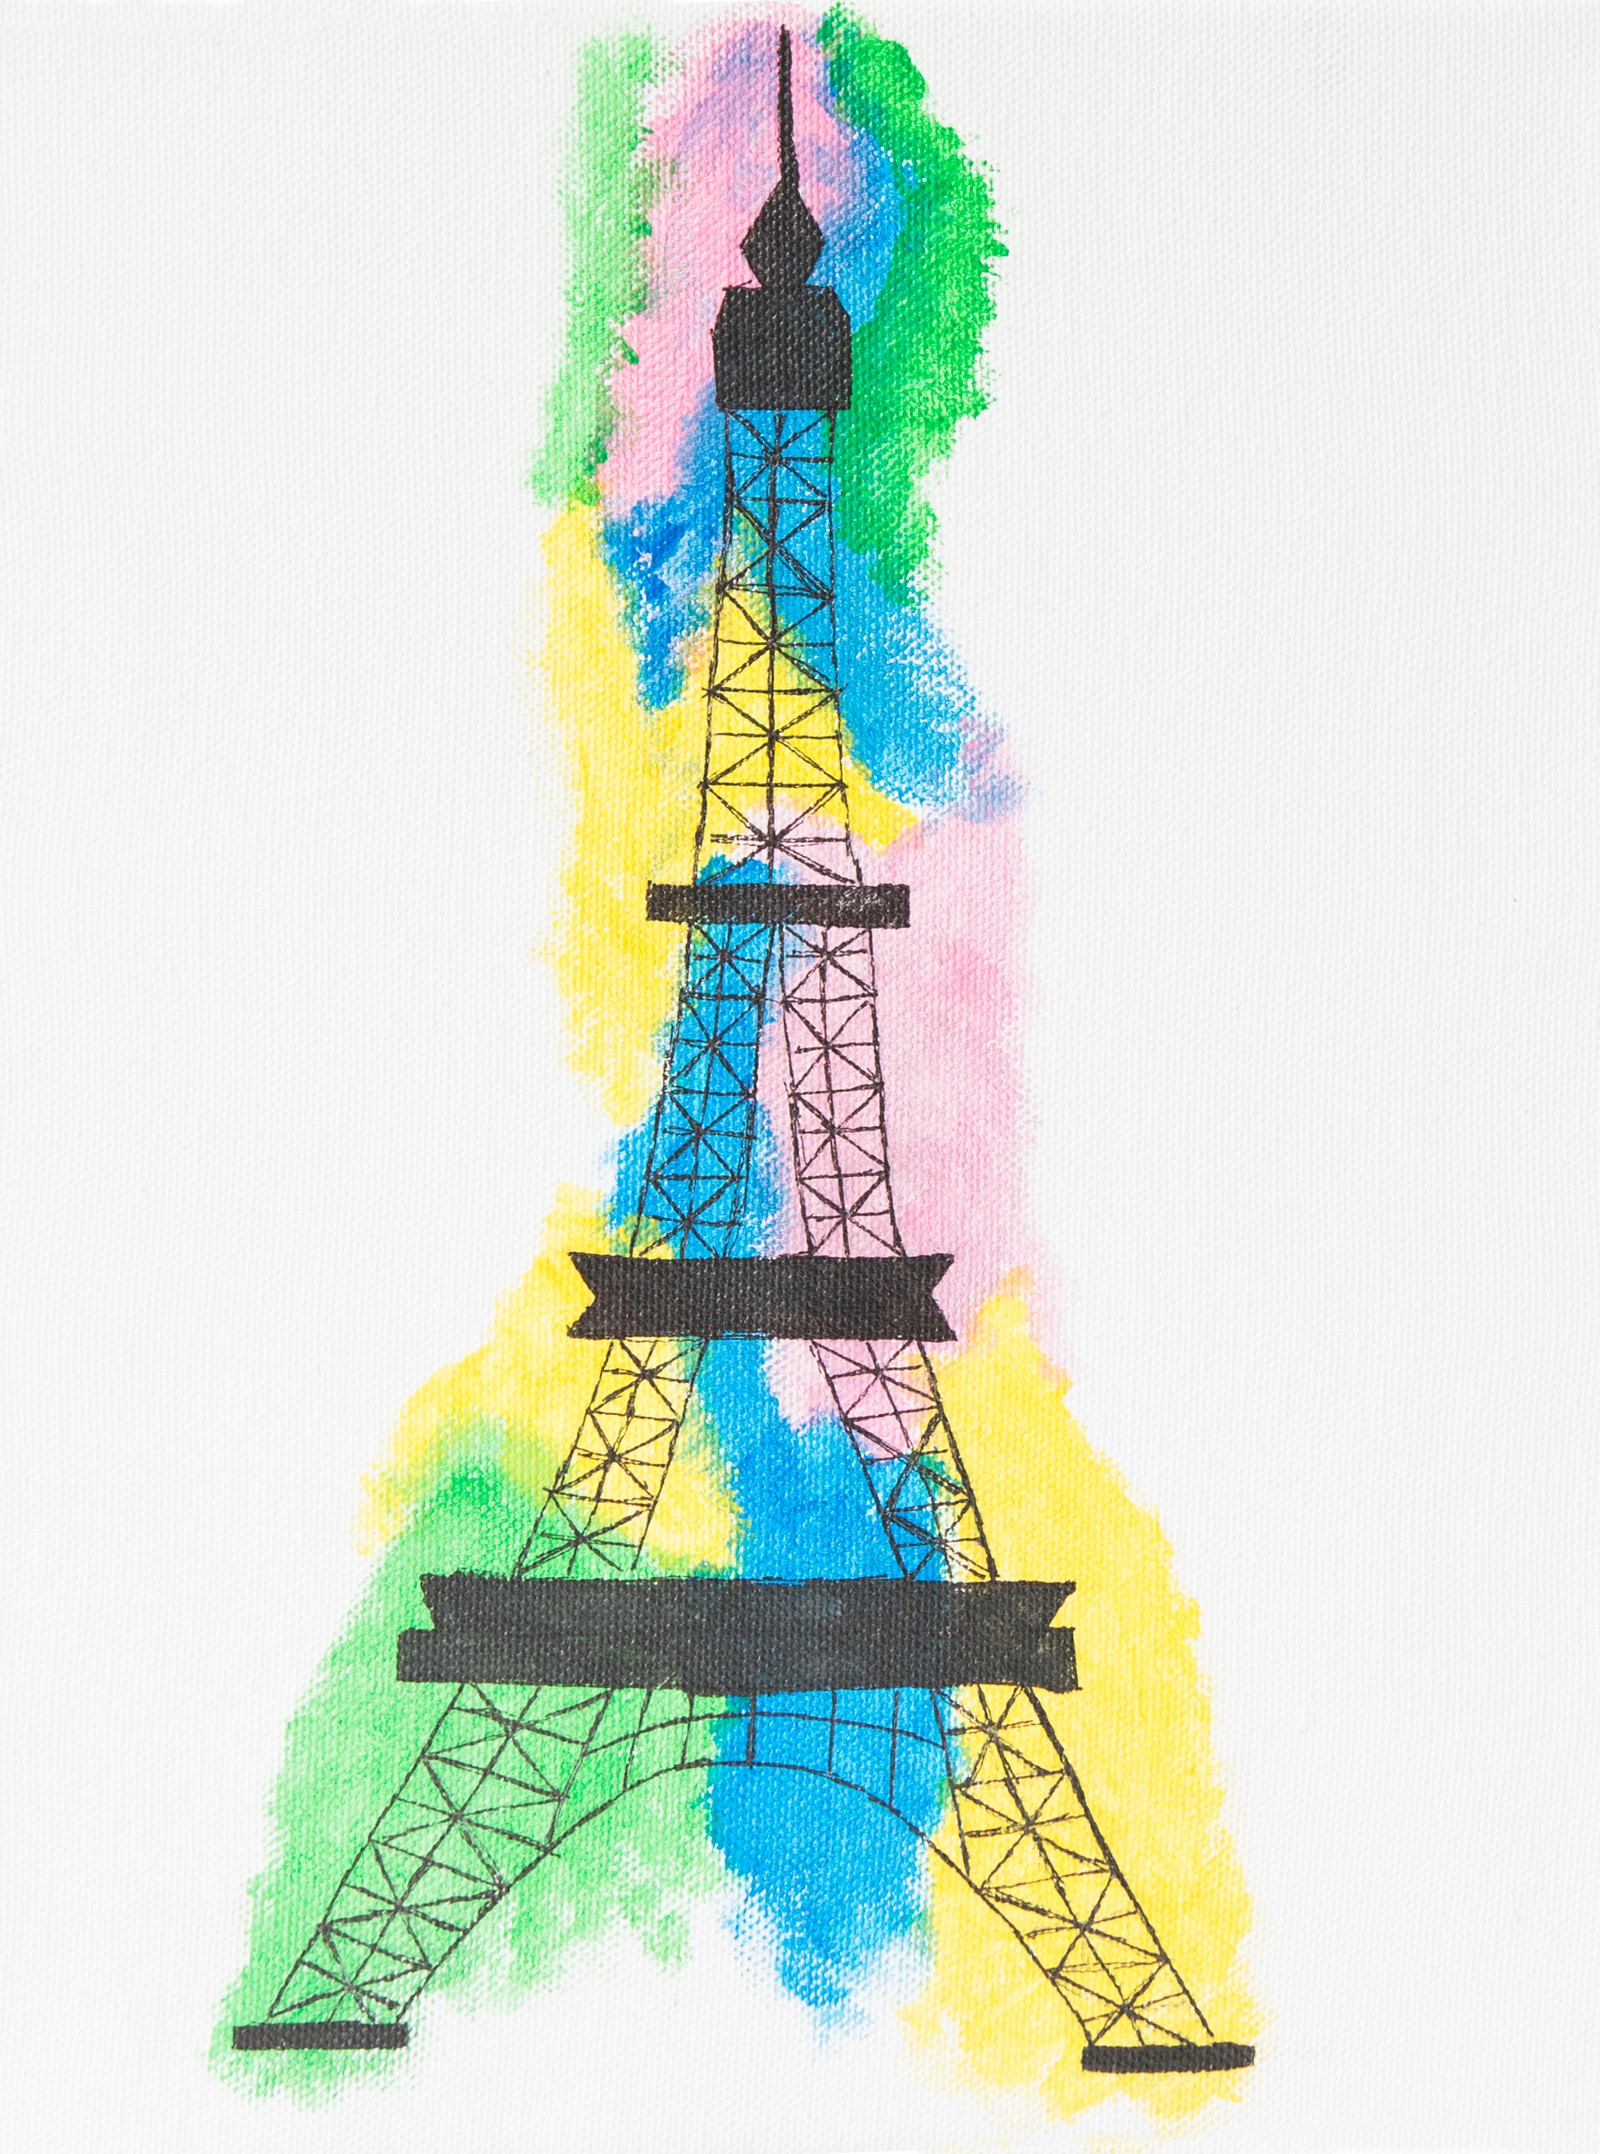 Eiffeltårnet - Kine Haugeplass, Aurland